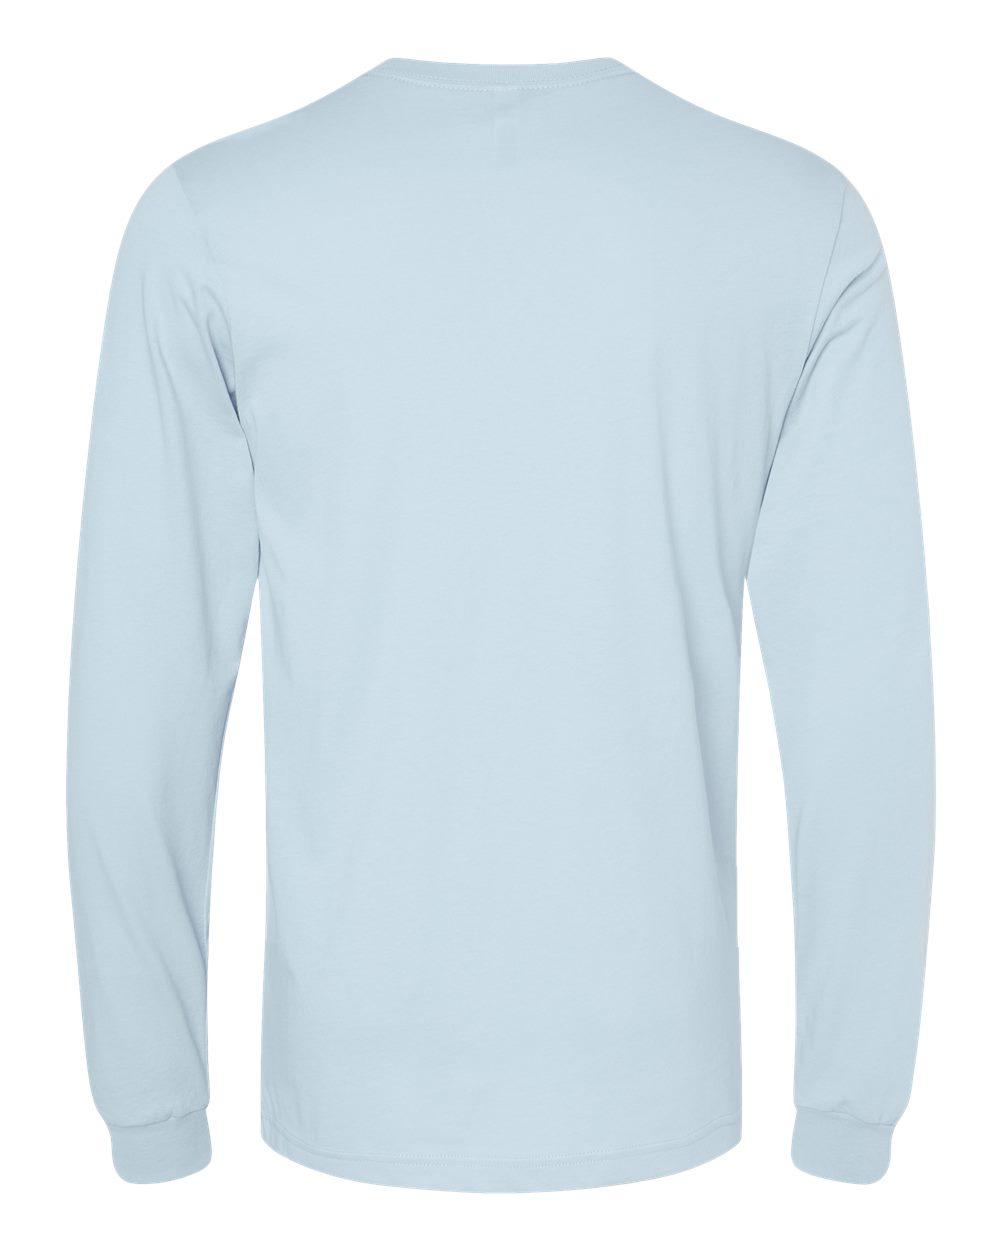 Bella-Canvas-Mens-Blank-Top-Long-Sleeve-Jersey-Tee-T-Shirt-3501-up-to-3XL thumbnail 16